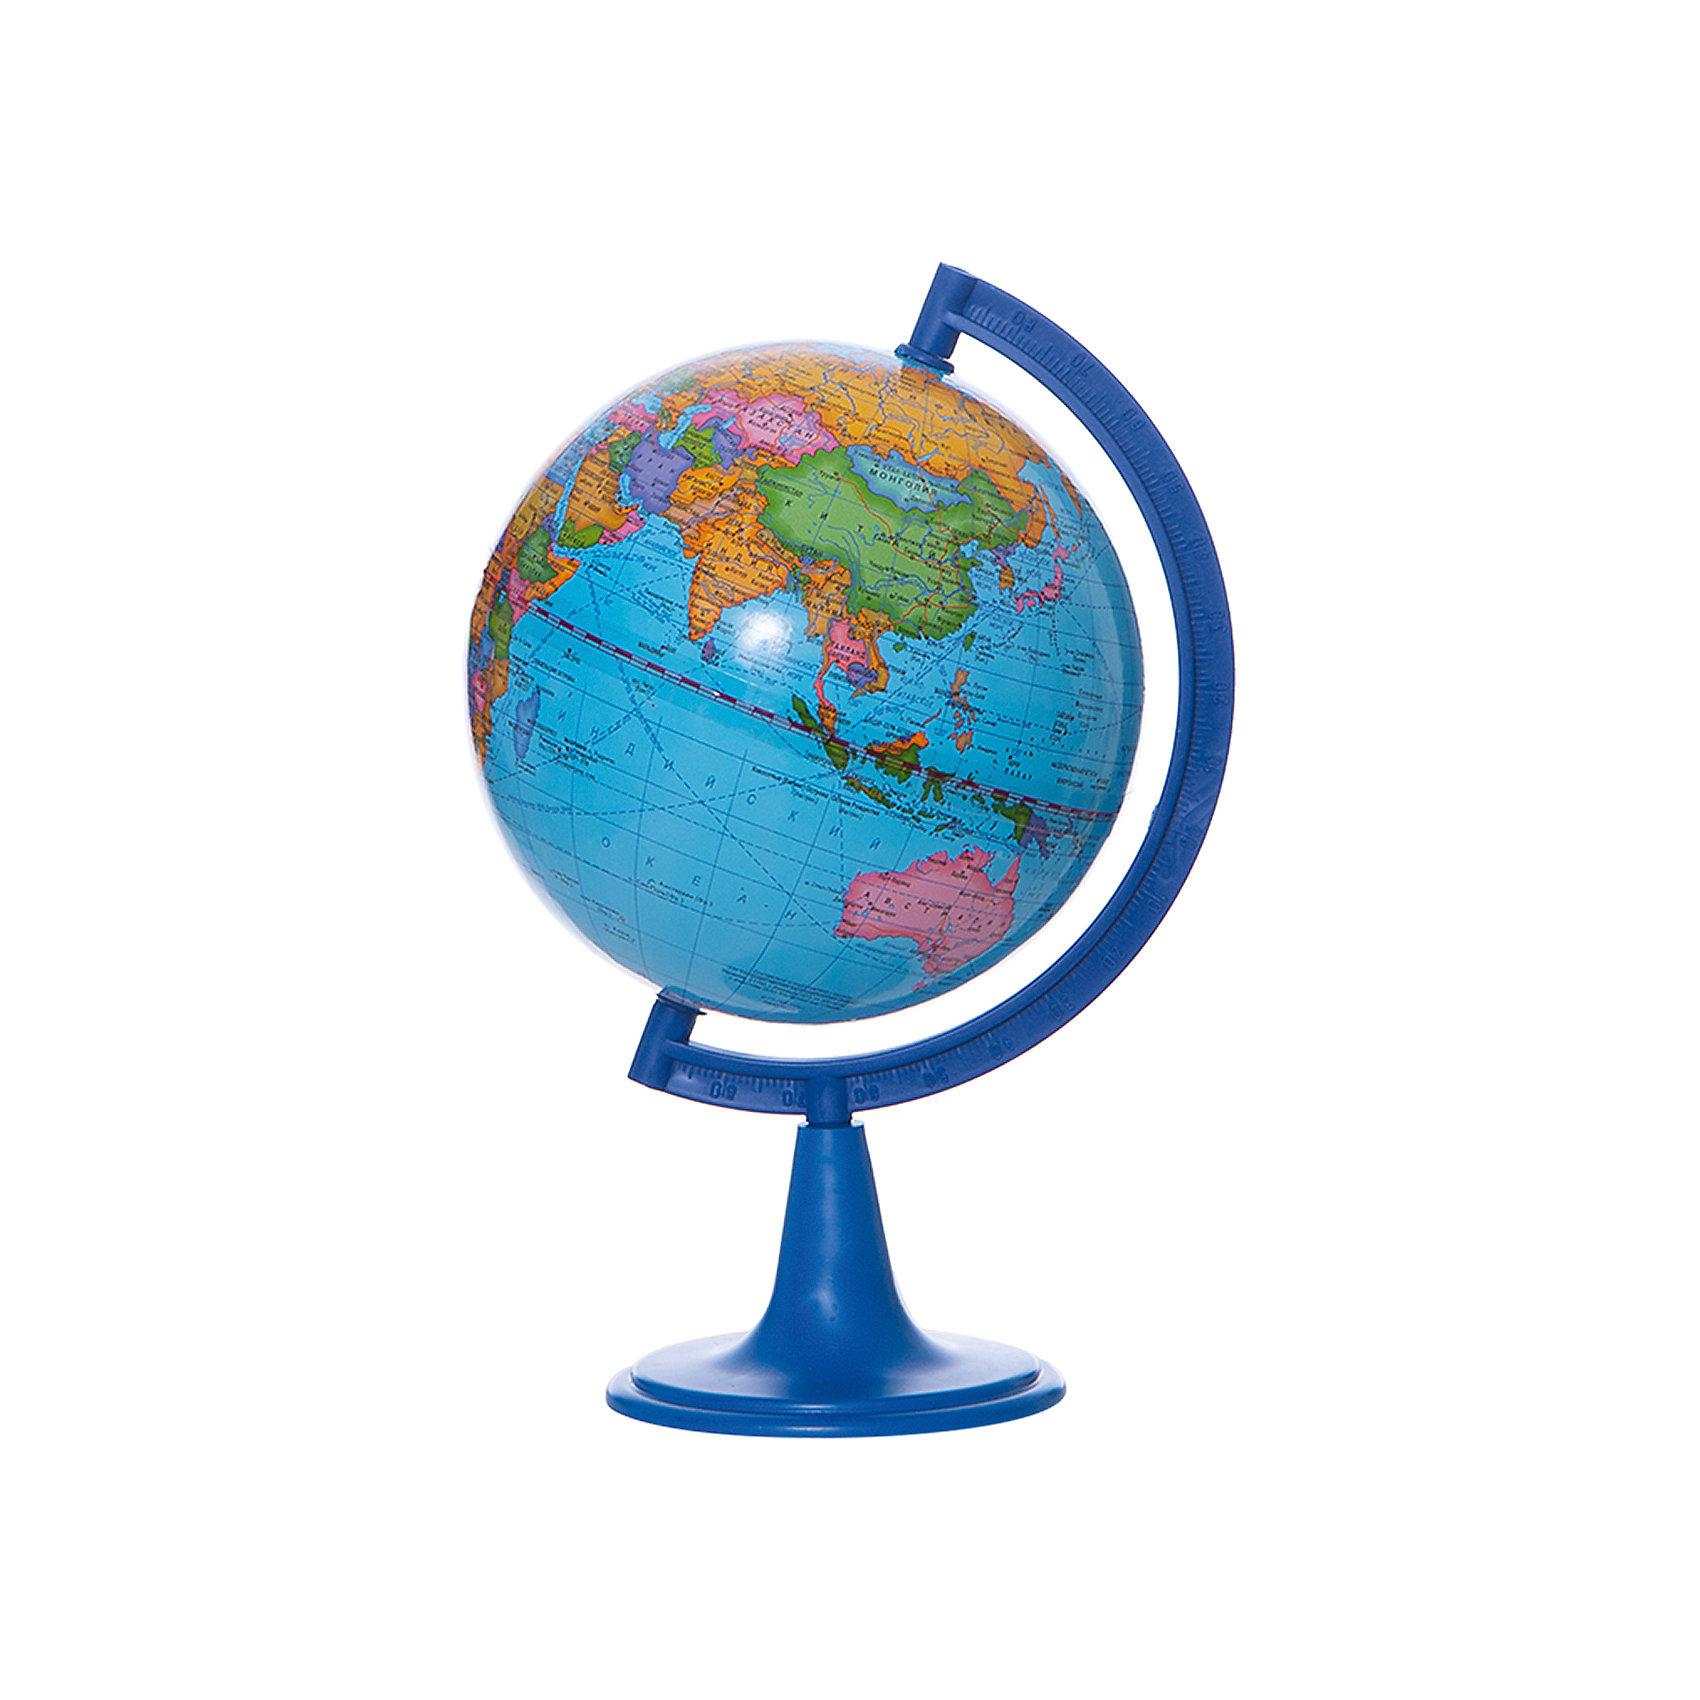 Глобус Земли политический, диаметр 150 ммДиаметр: 150 мм<br><br>Масштаб: 1:84000000<br><br>Материал подставки: Пластик<br><br>Цвет подставки: Черный<br><br>Ширина мм: 160<br>Глубина мм: 160<br>Высота мм: 250<br>Вес г: 450<br>Возраст от месяцев: 72<br>Возраст до месяцев: 2147483647<br>Пол: Унисекс<br>Возраст: Детский<br>SKU: 5518221